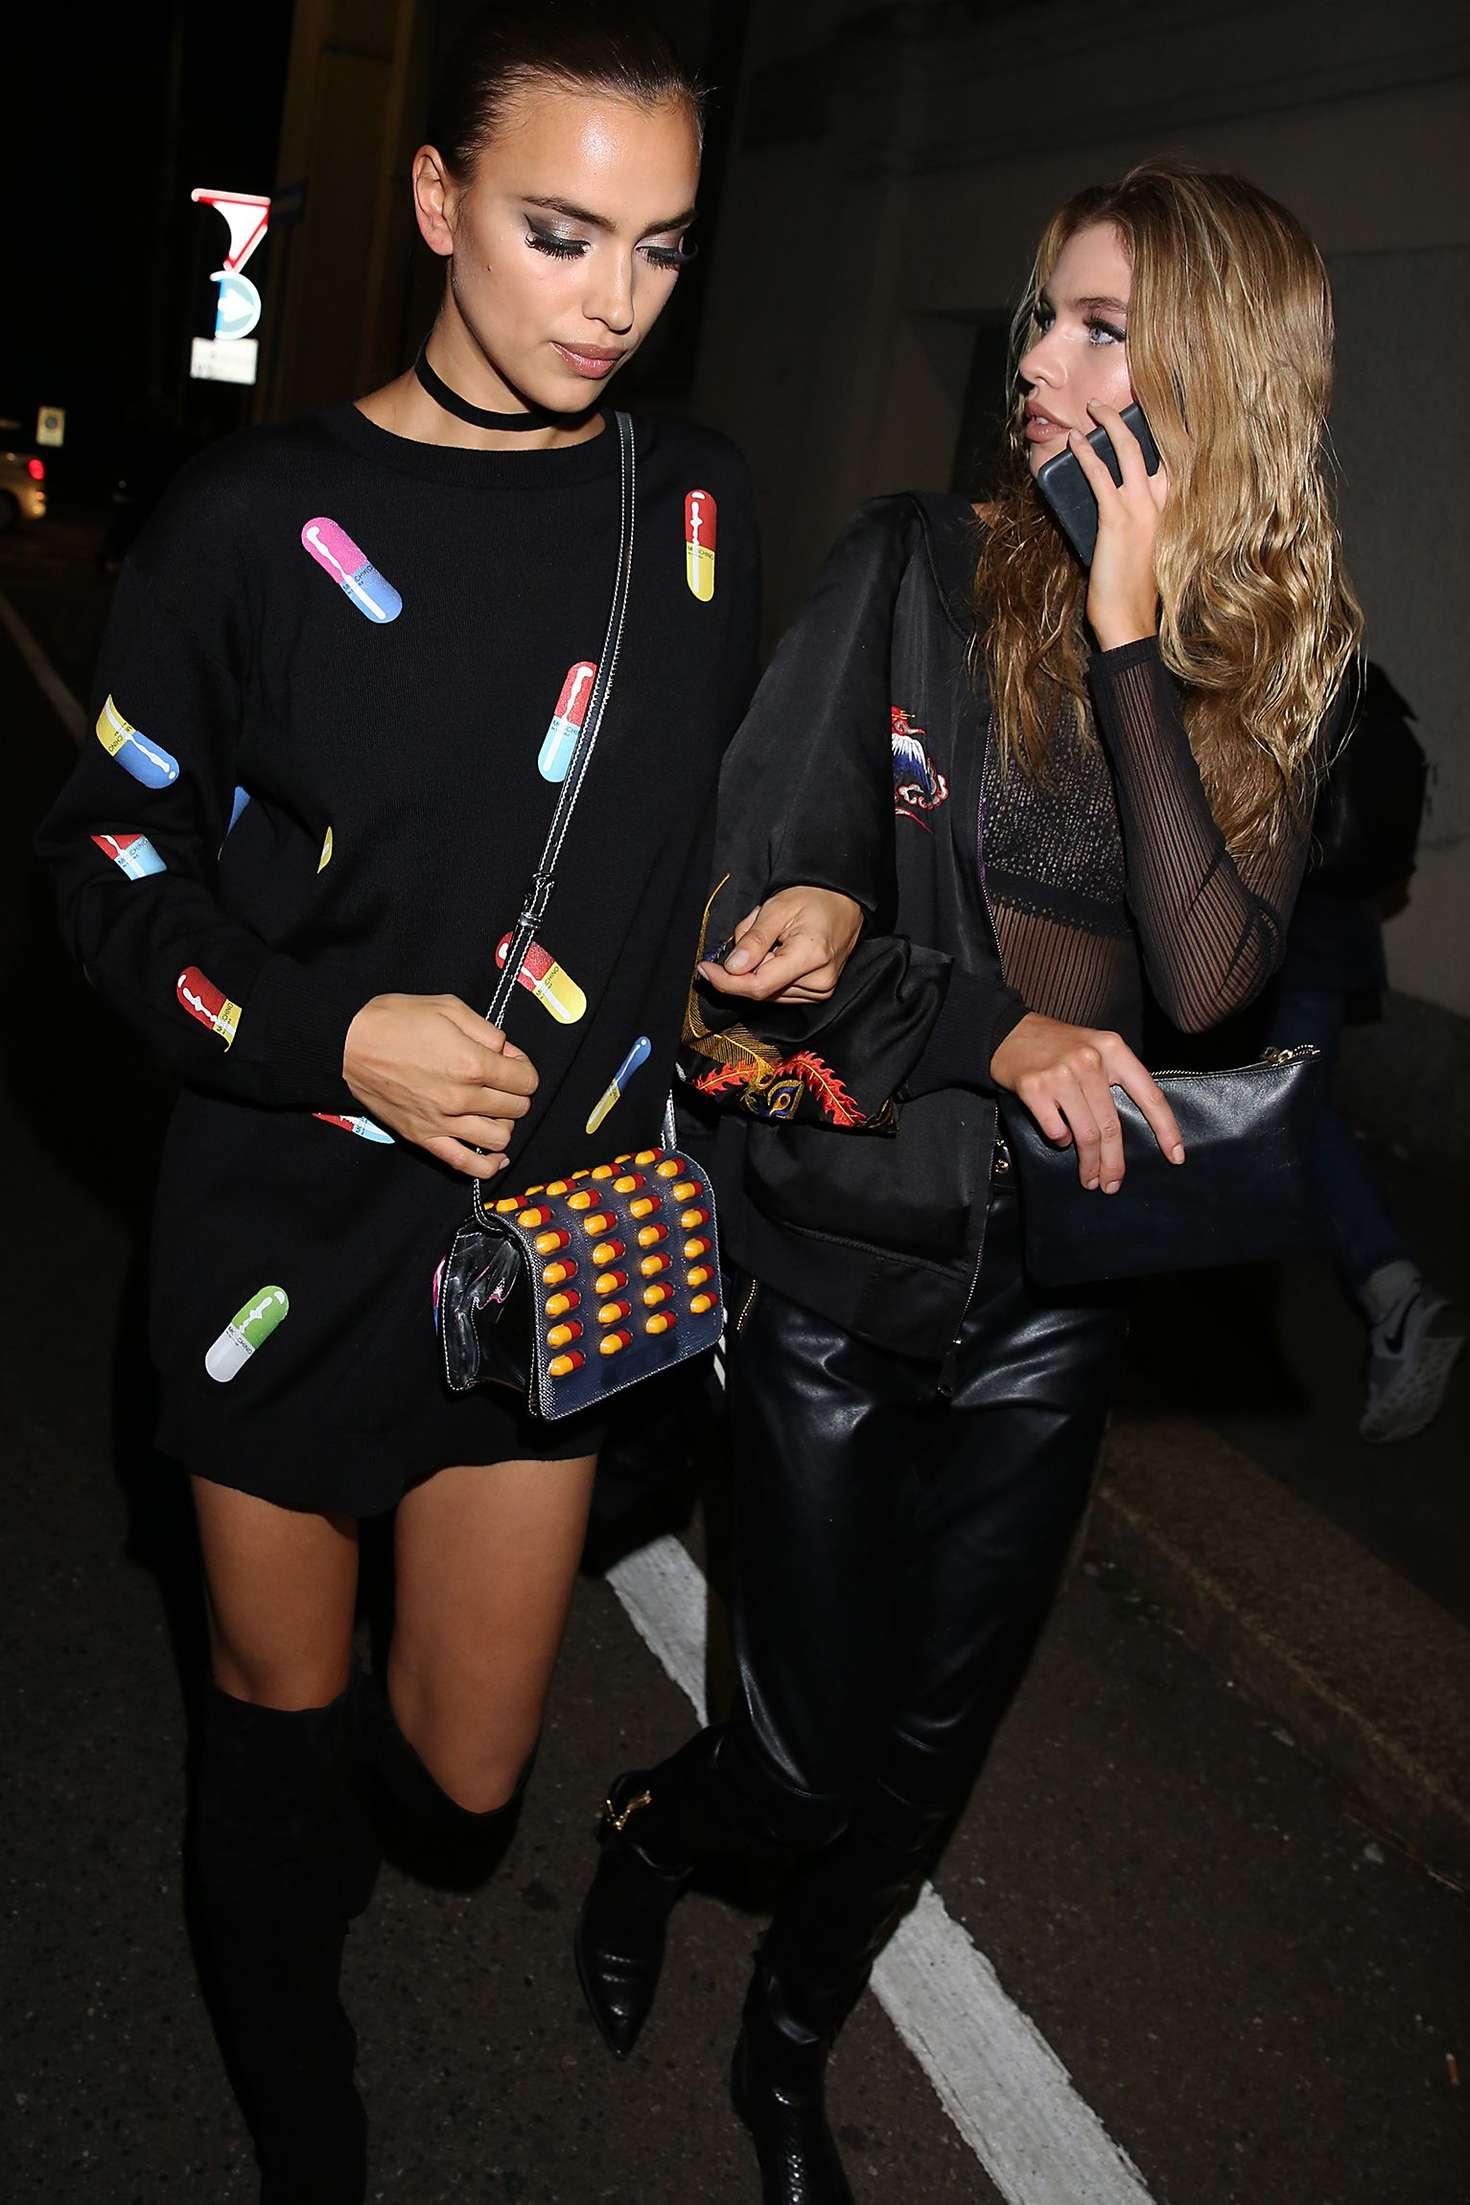 Irina Shayk 2016 : Irina Shayk and Stella Maxwell Leaving Moschino Show 2017 at Milan Fashion Week -09